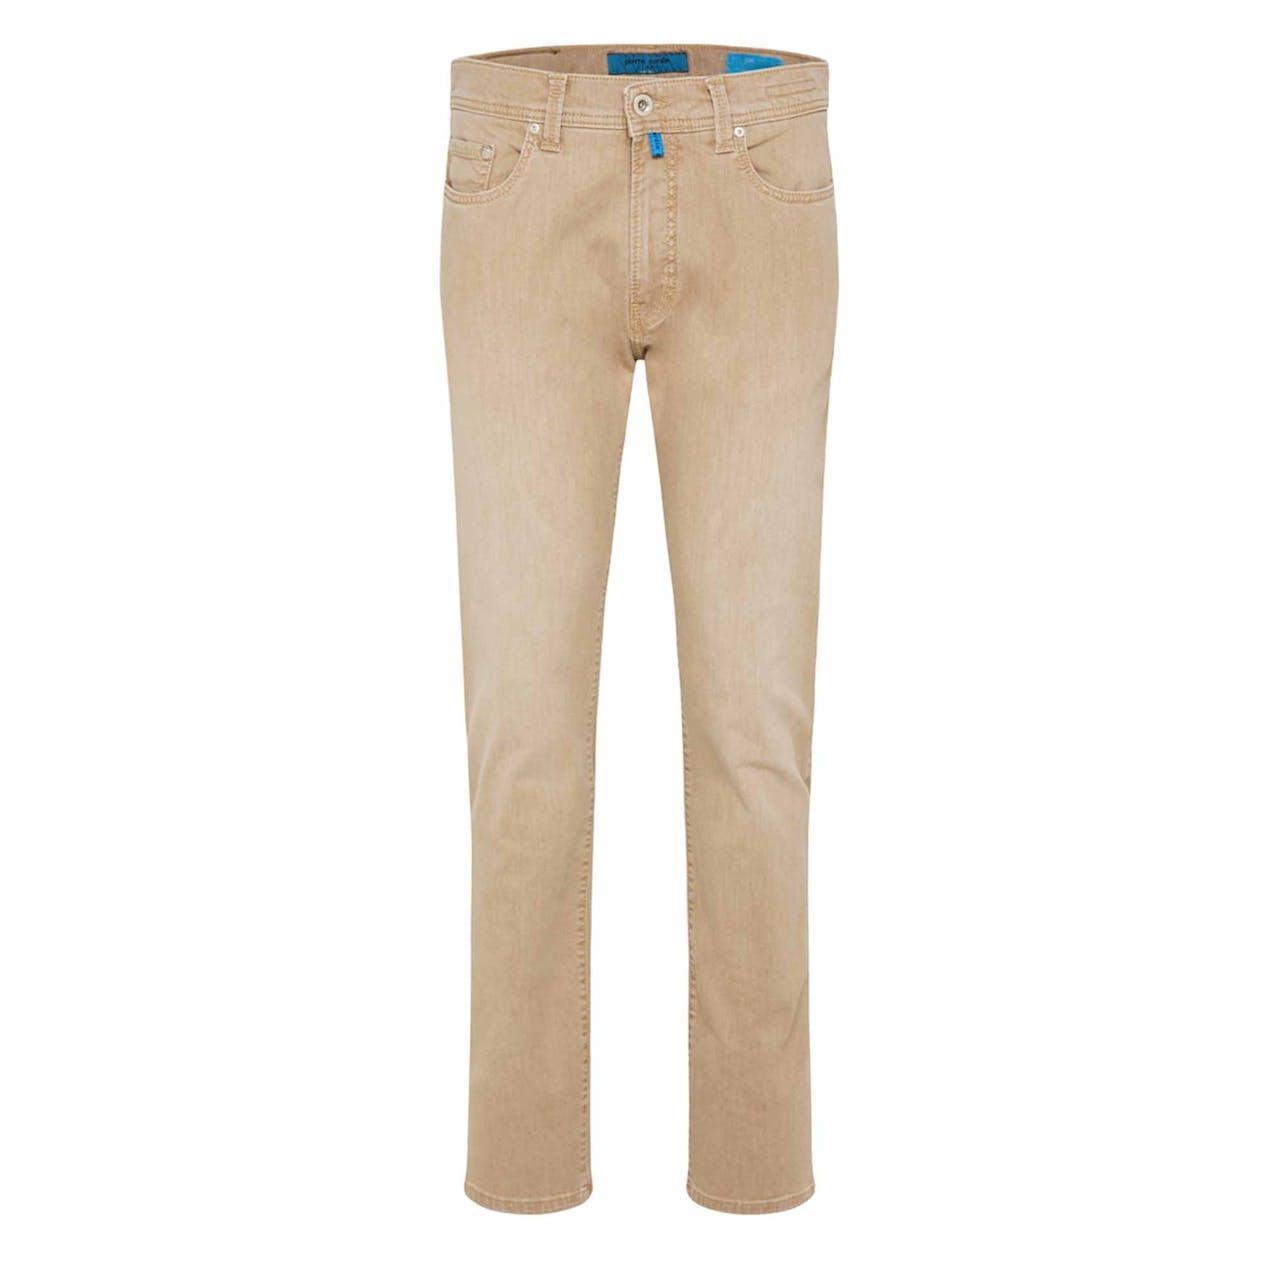 Jeans - Lyon tapered - 5 Pocket